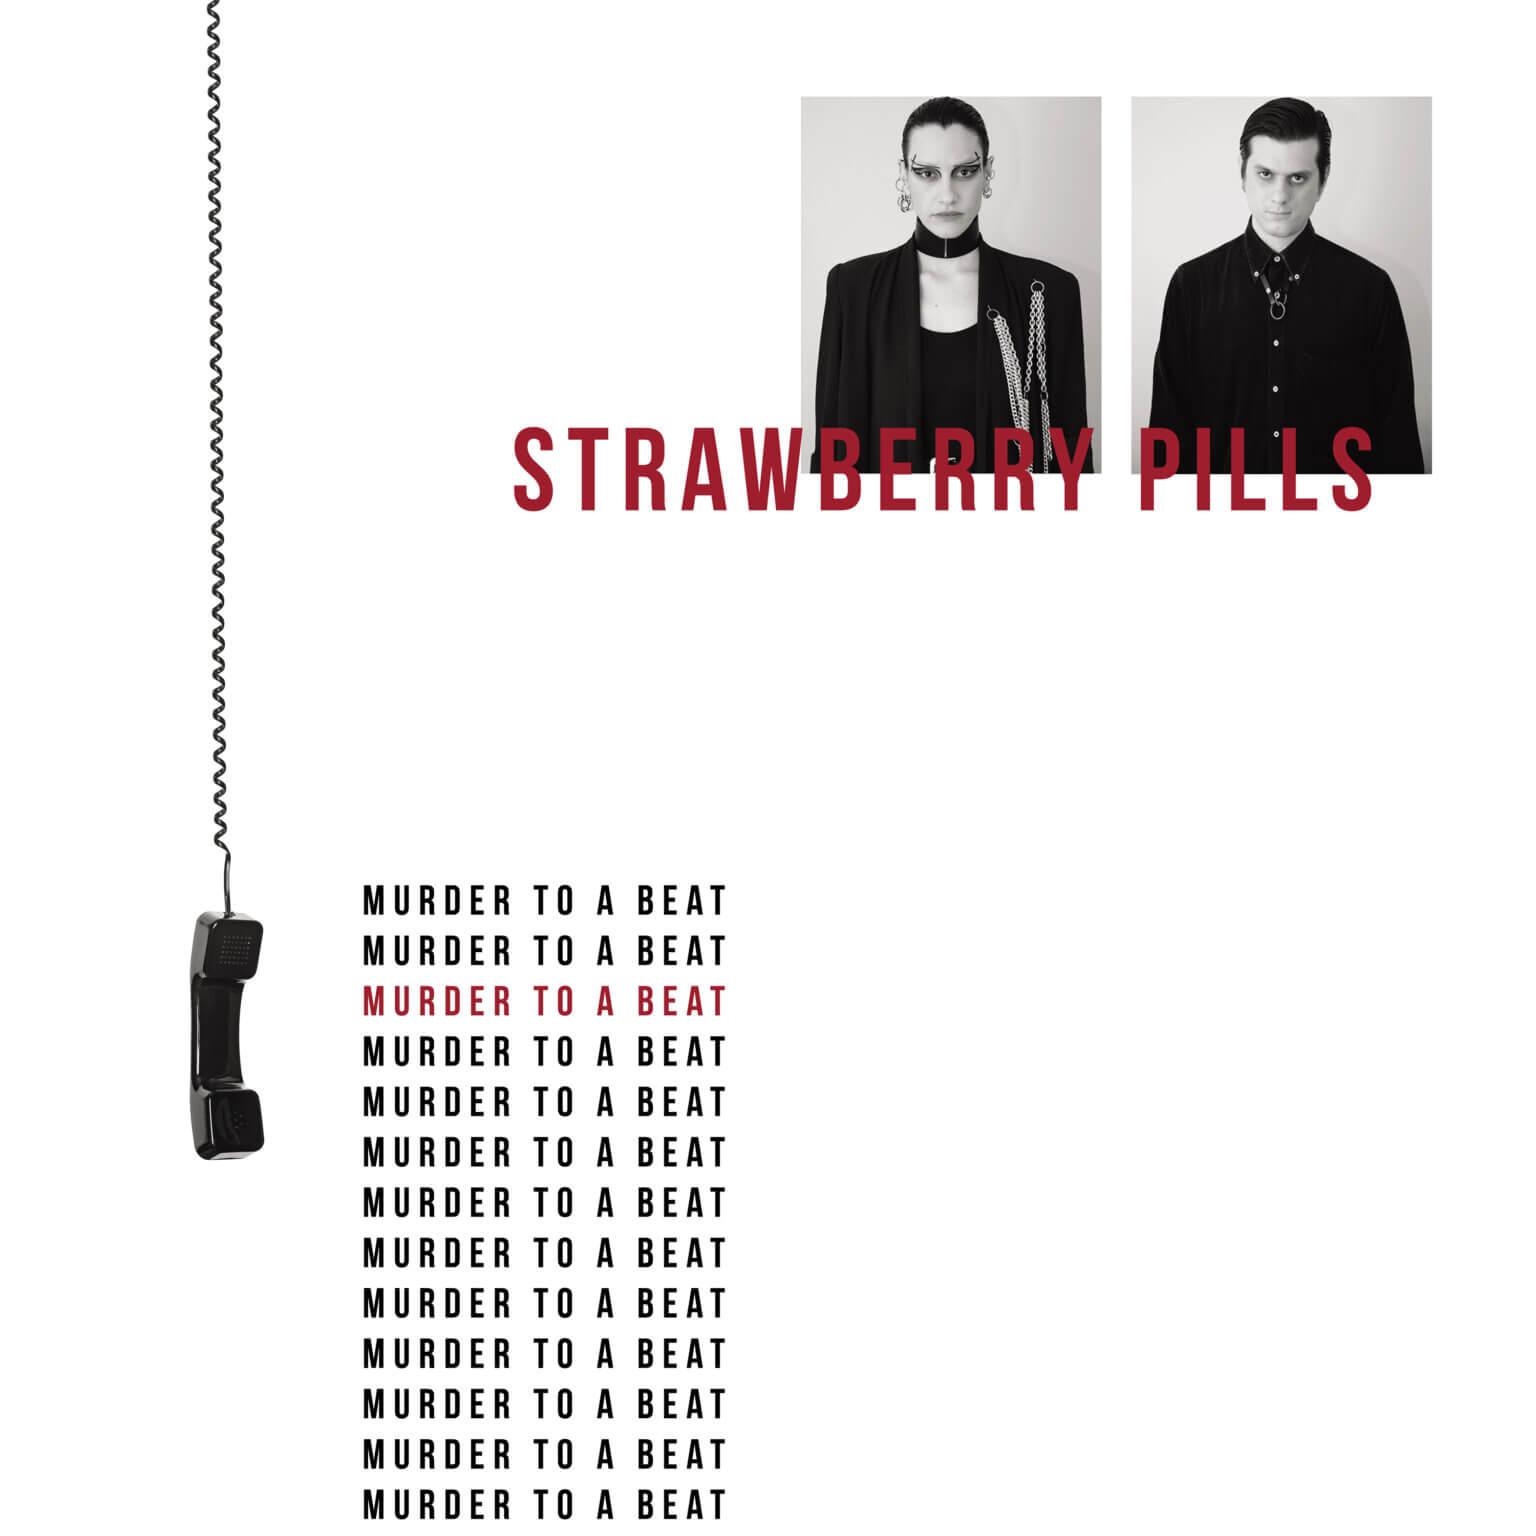 Strawberry Pills Stream new album Murder to a Beat